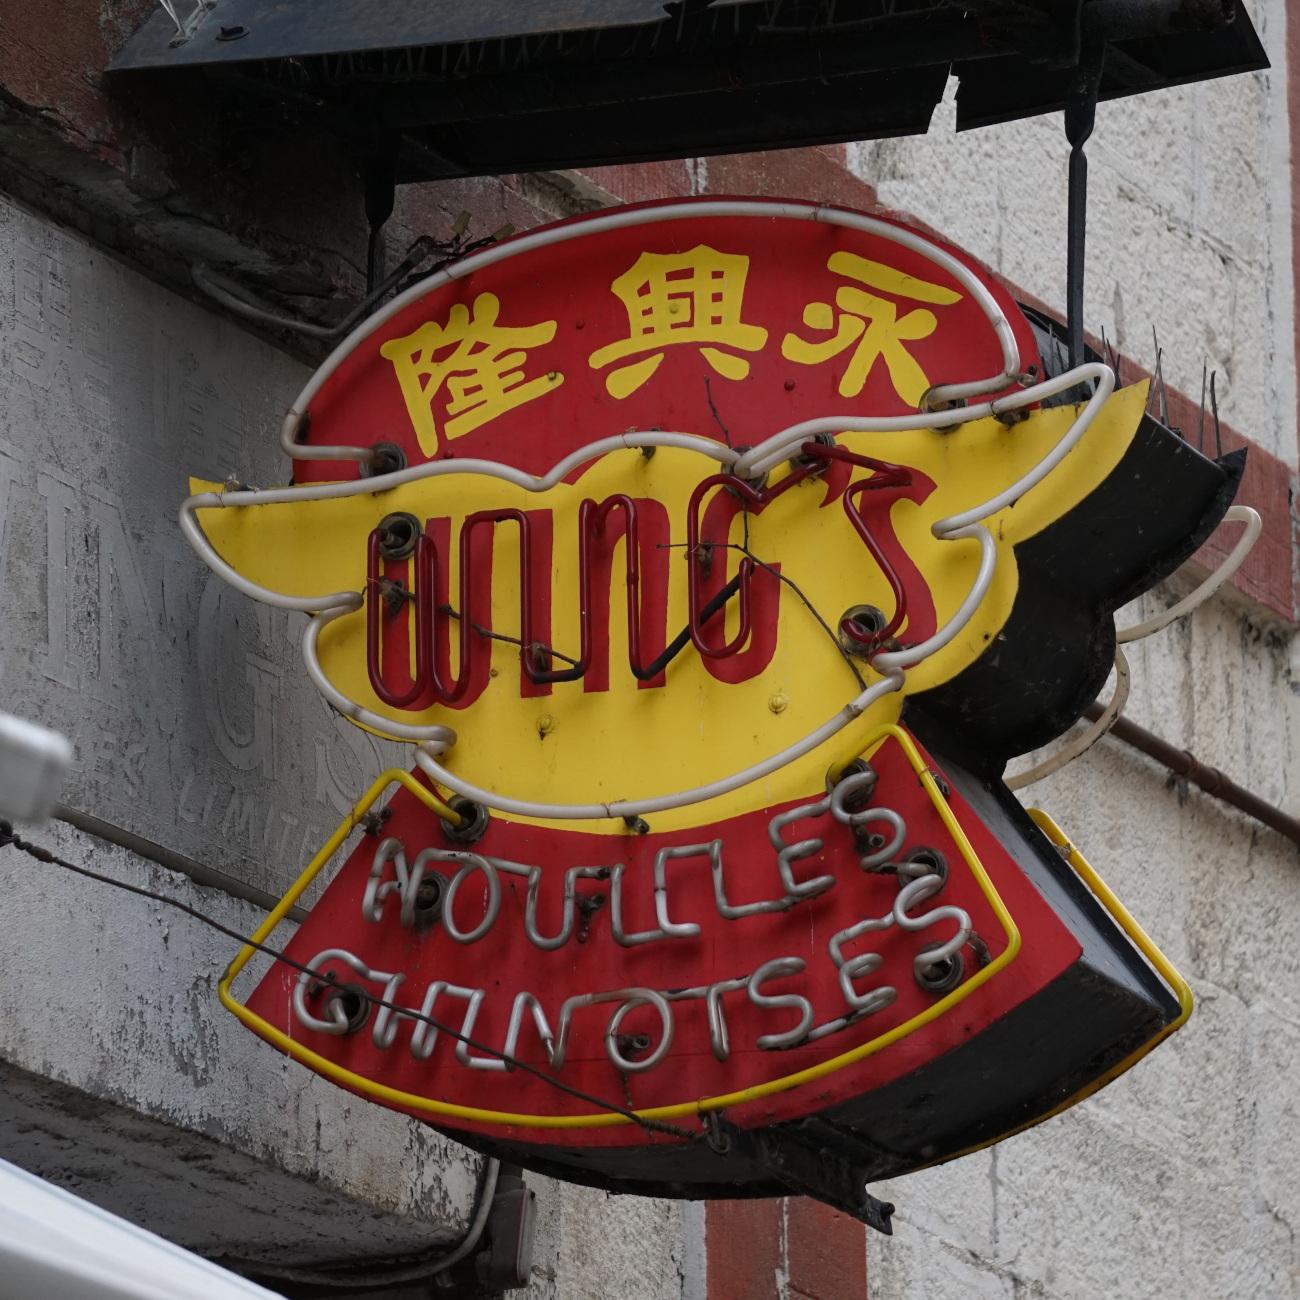 Enseigne Wings Nouilles chinoises